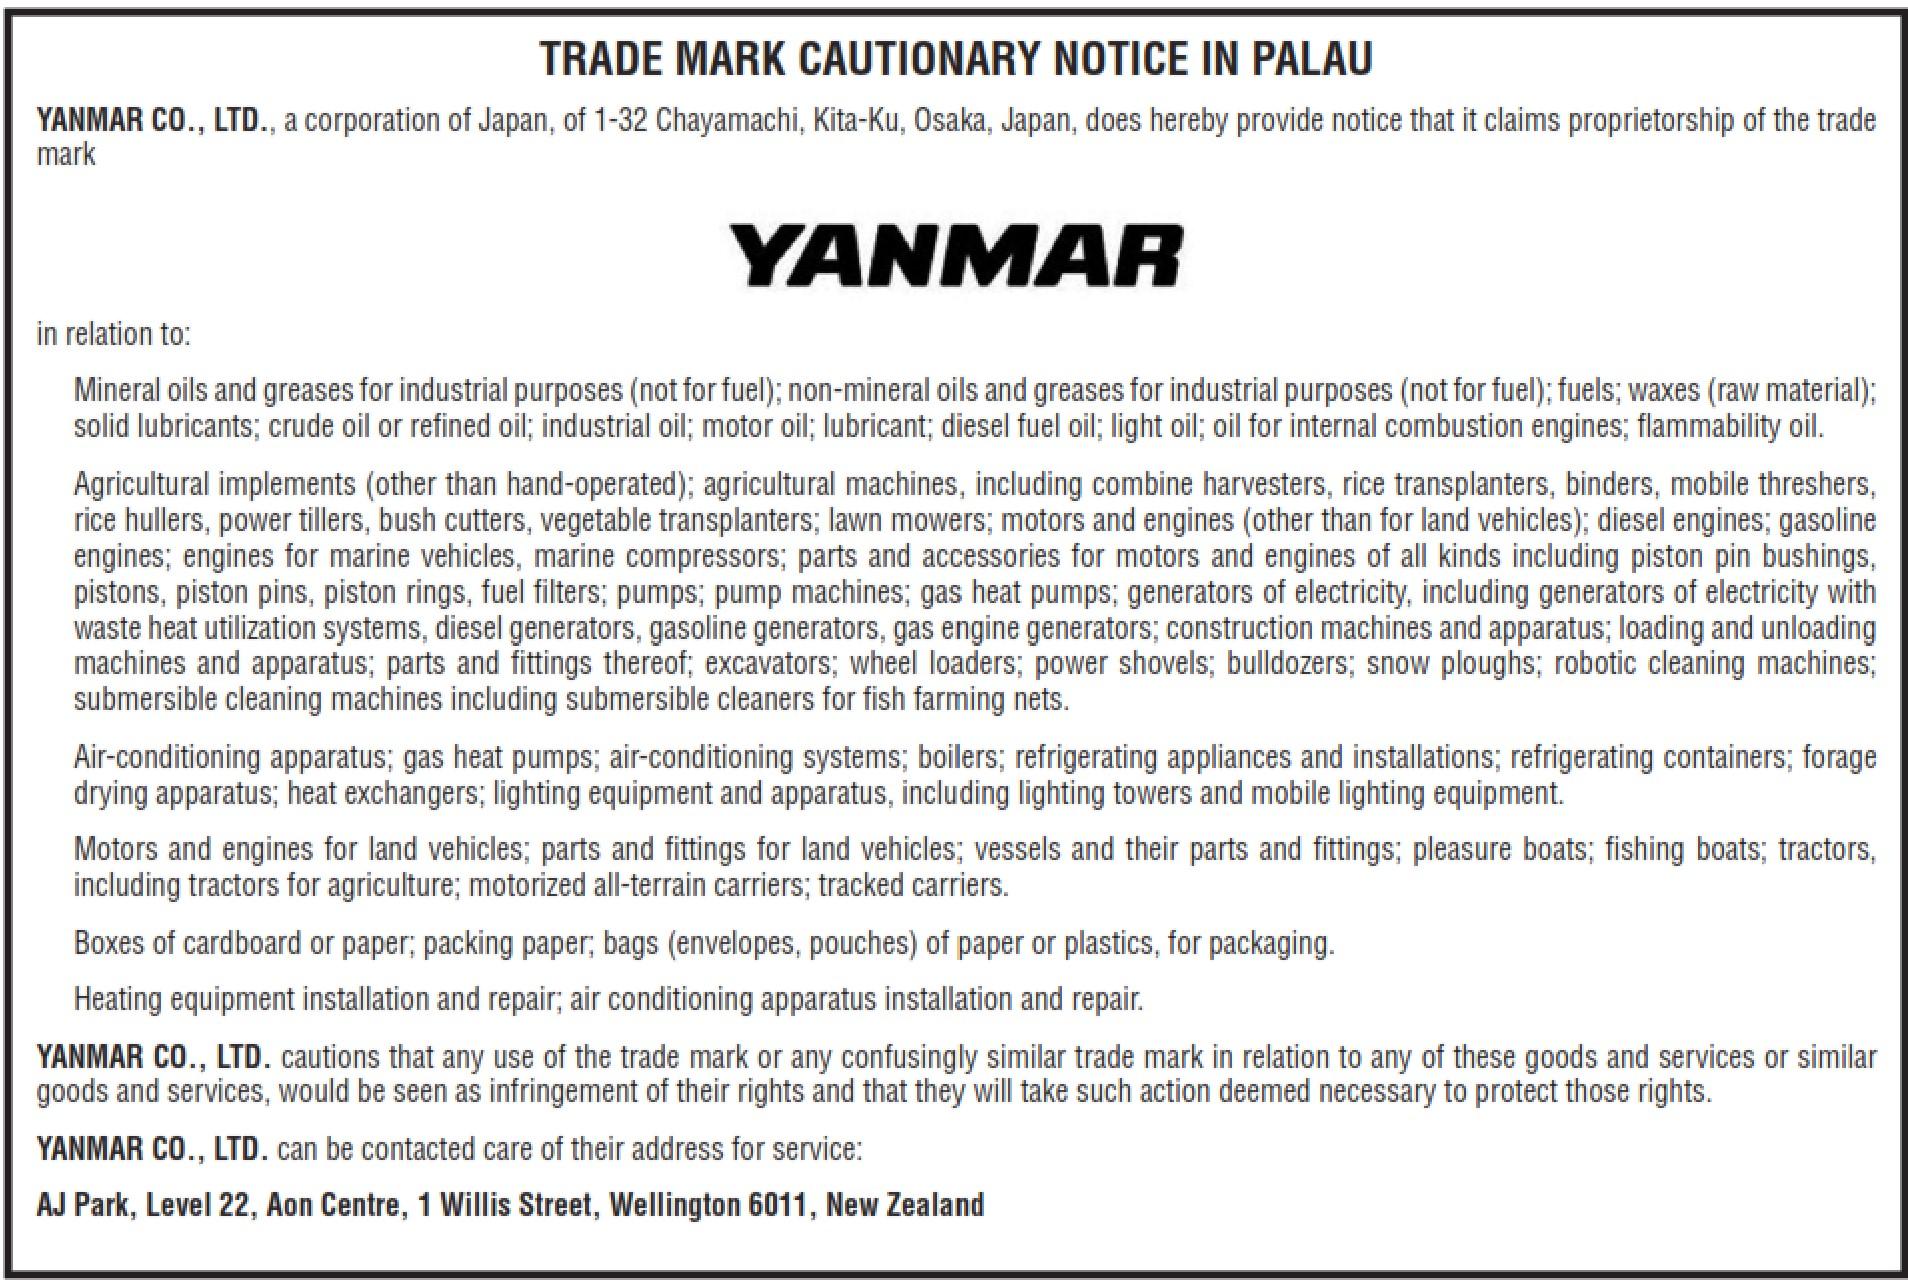 Yanmar Co Ltd